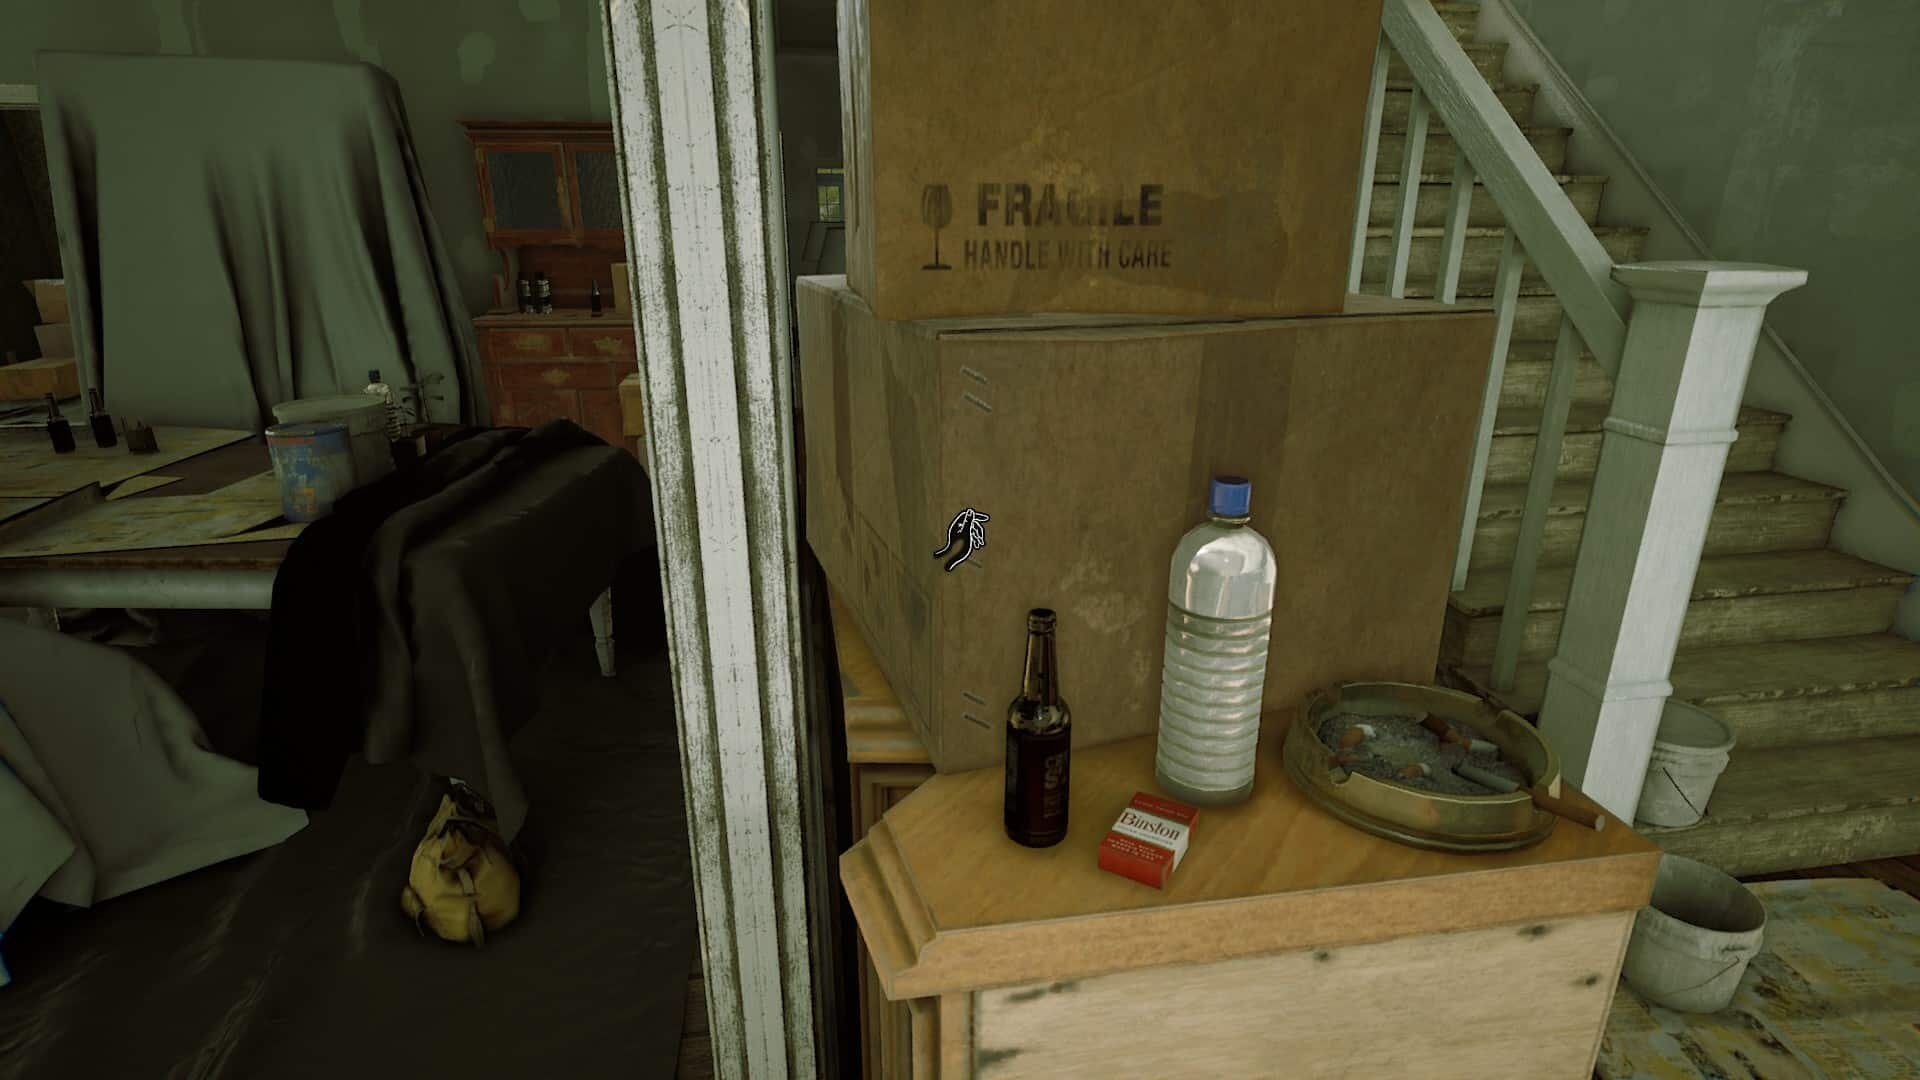 The Beast Inside game screenshot, single-use plastic bottle